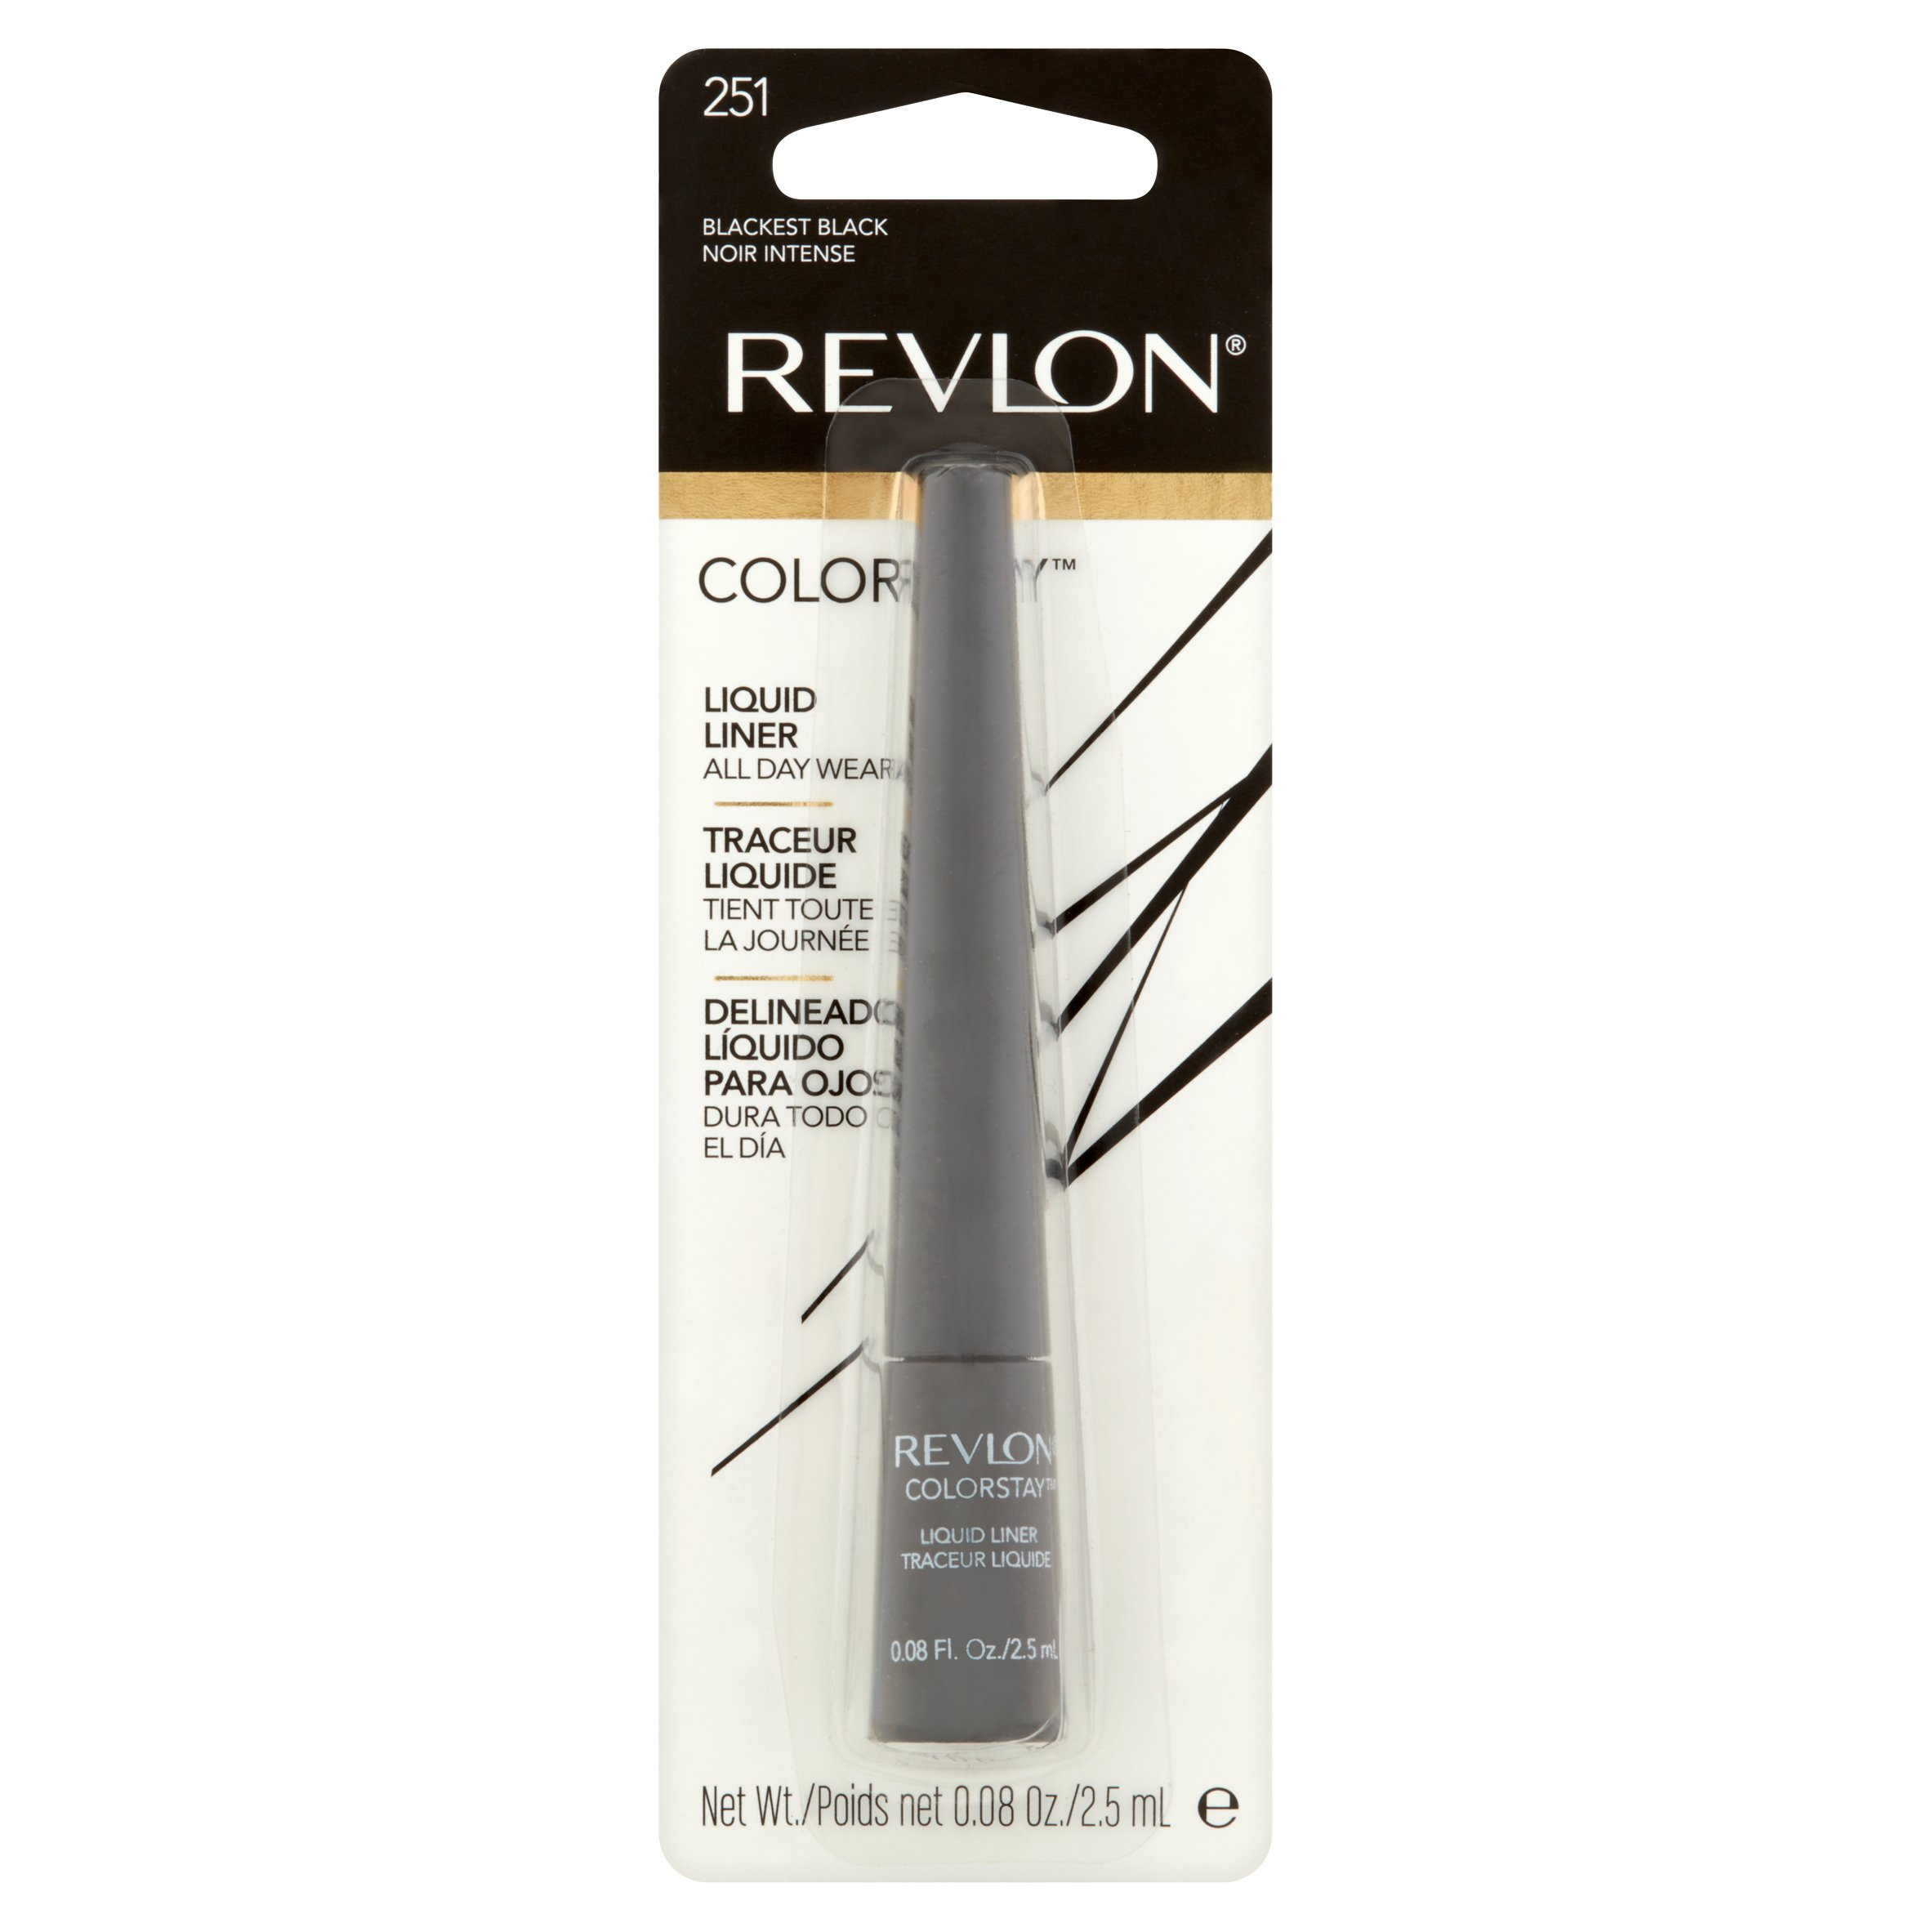 Revlon Colorstay Liquid Eyeliner.08 fl oz, Blackest Black